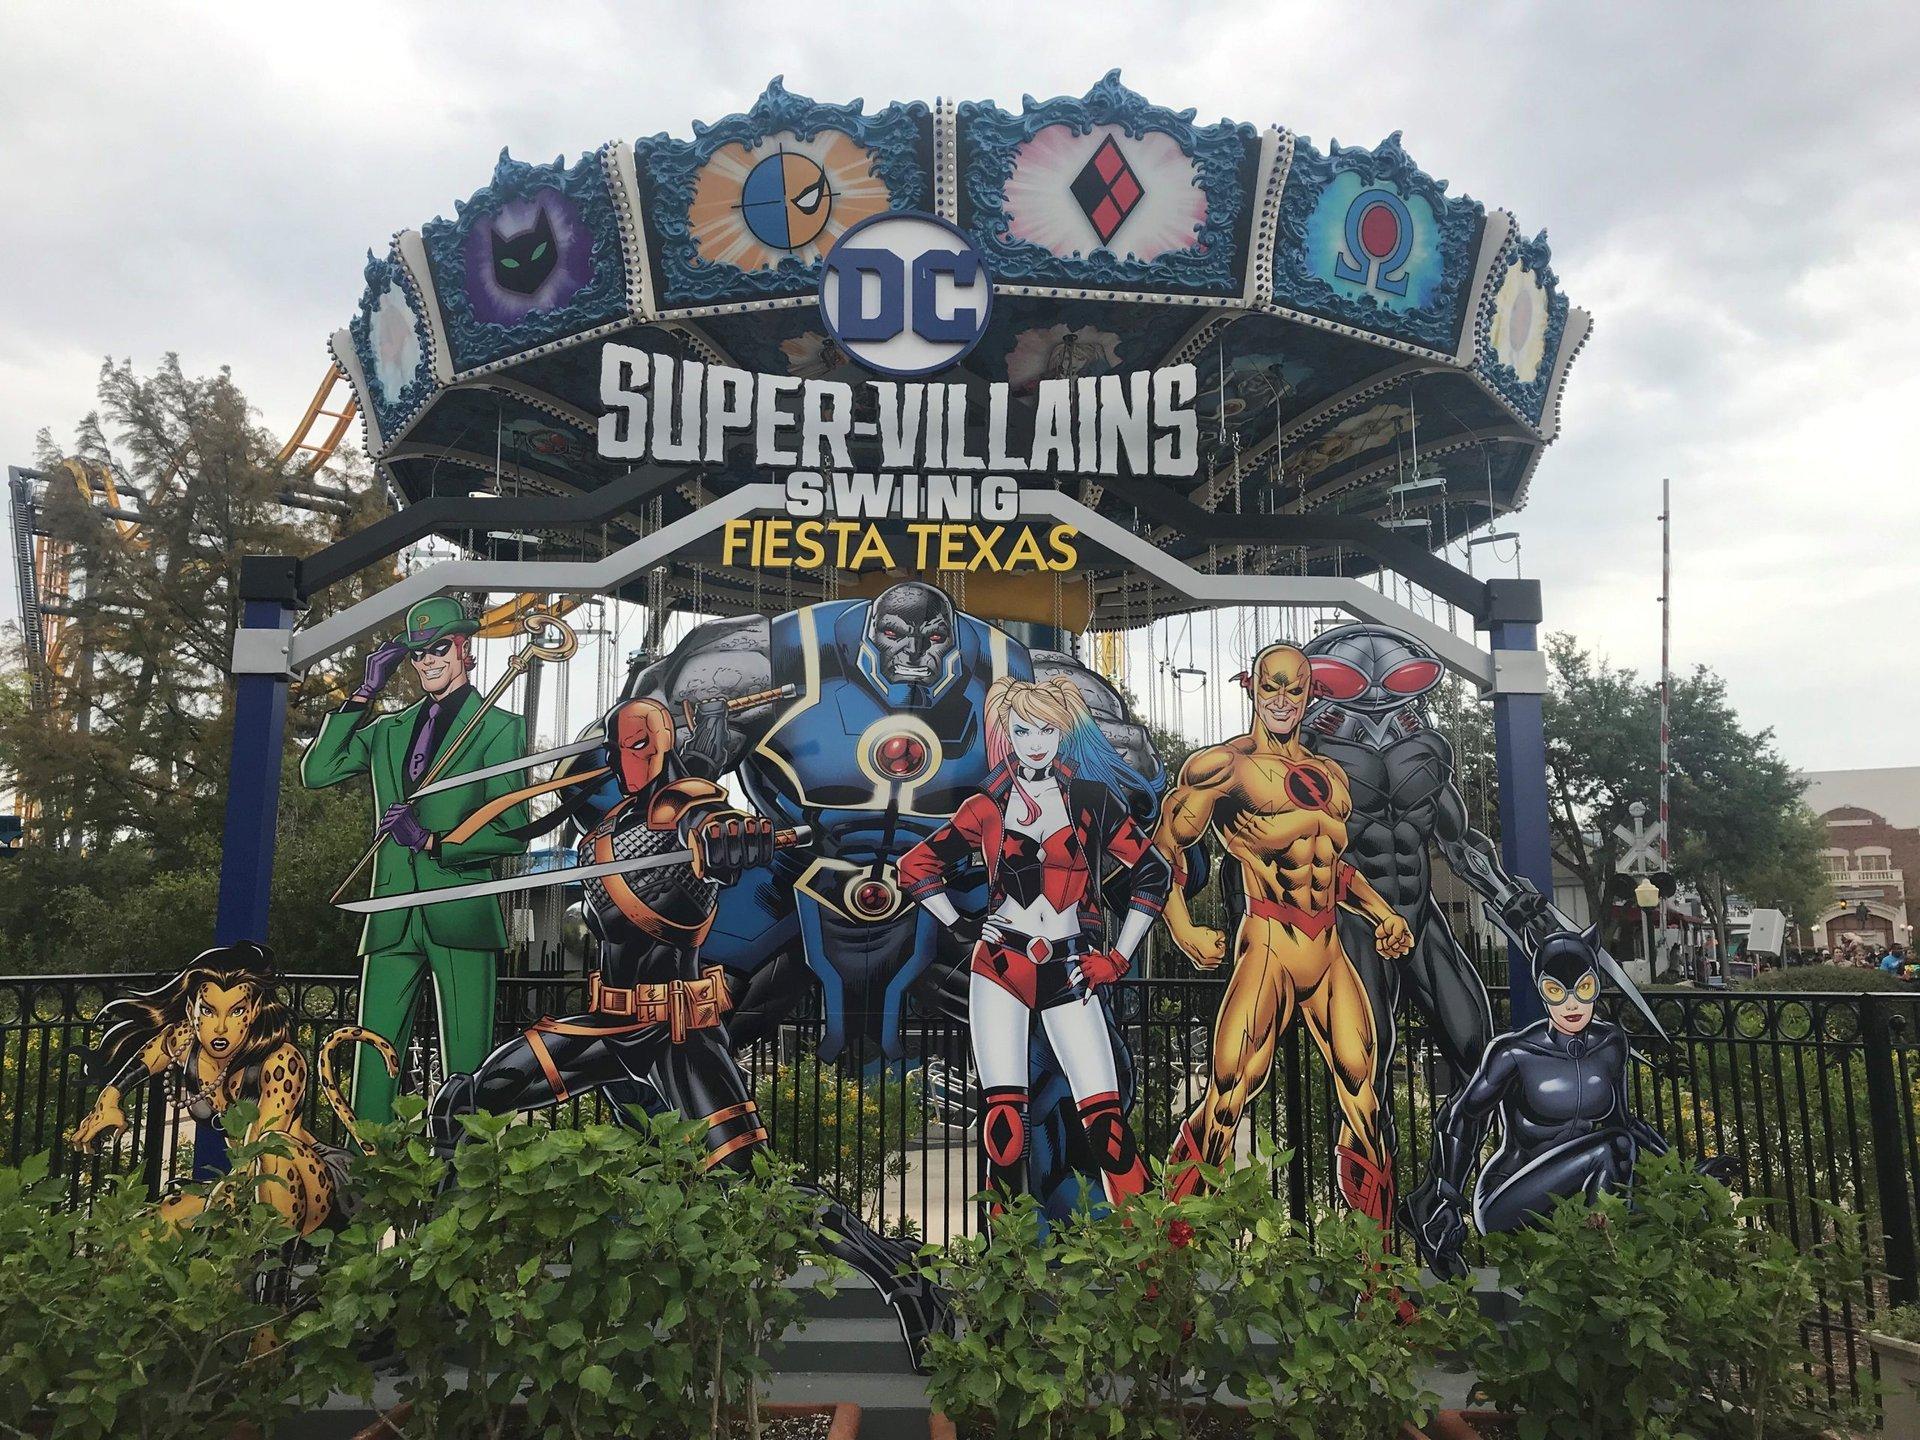 view of super villain swing